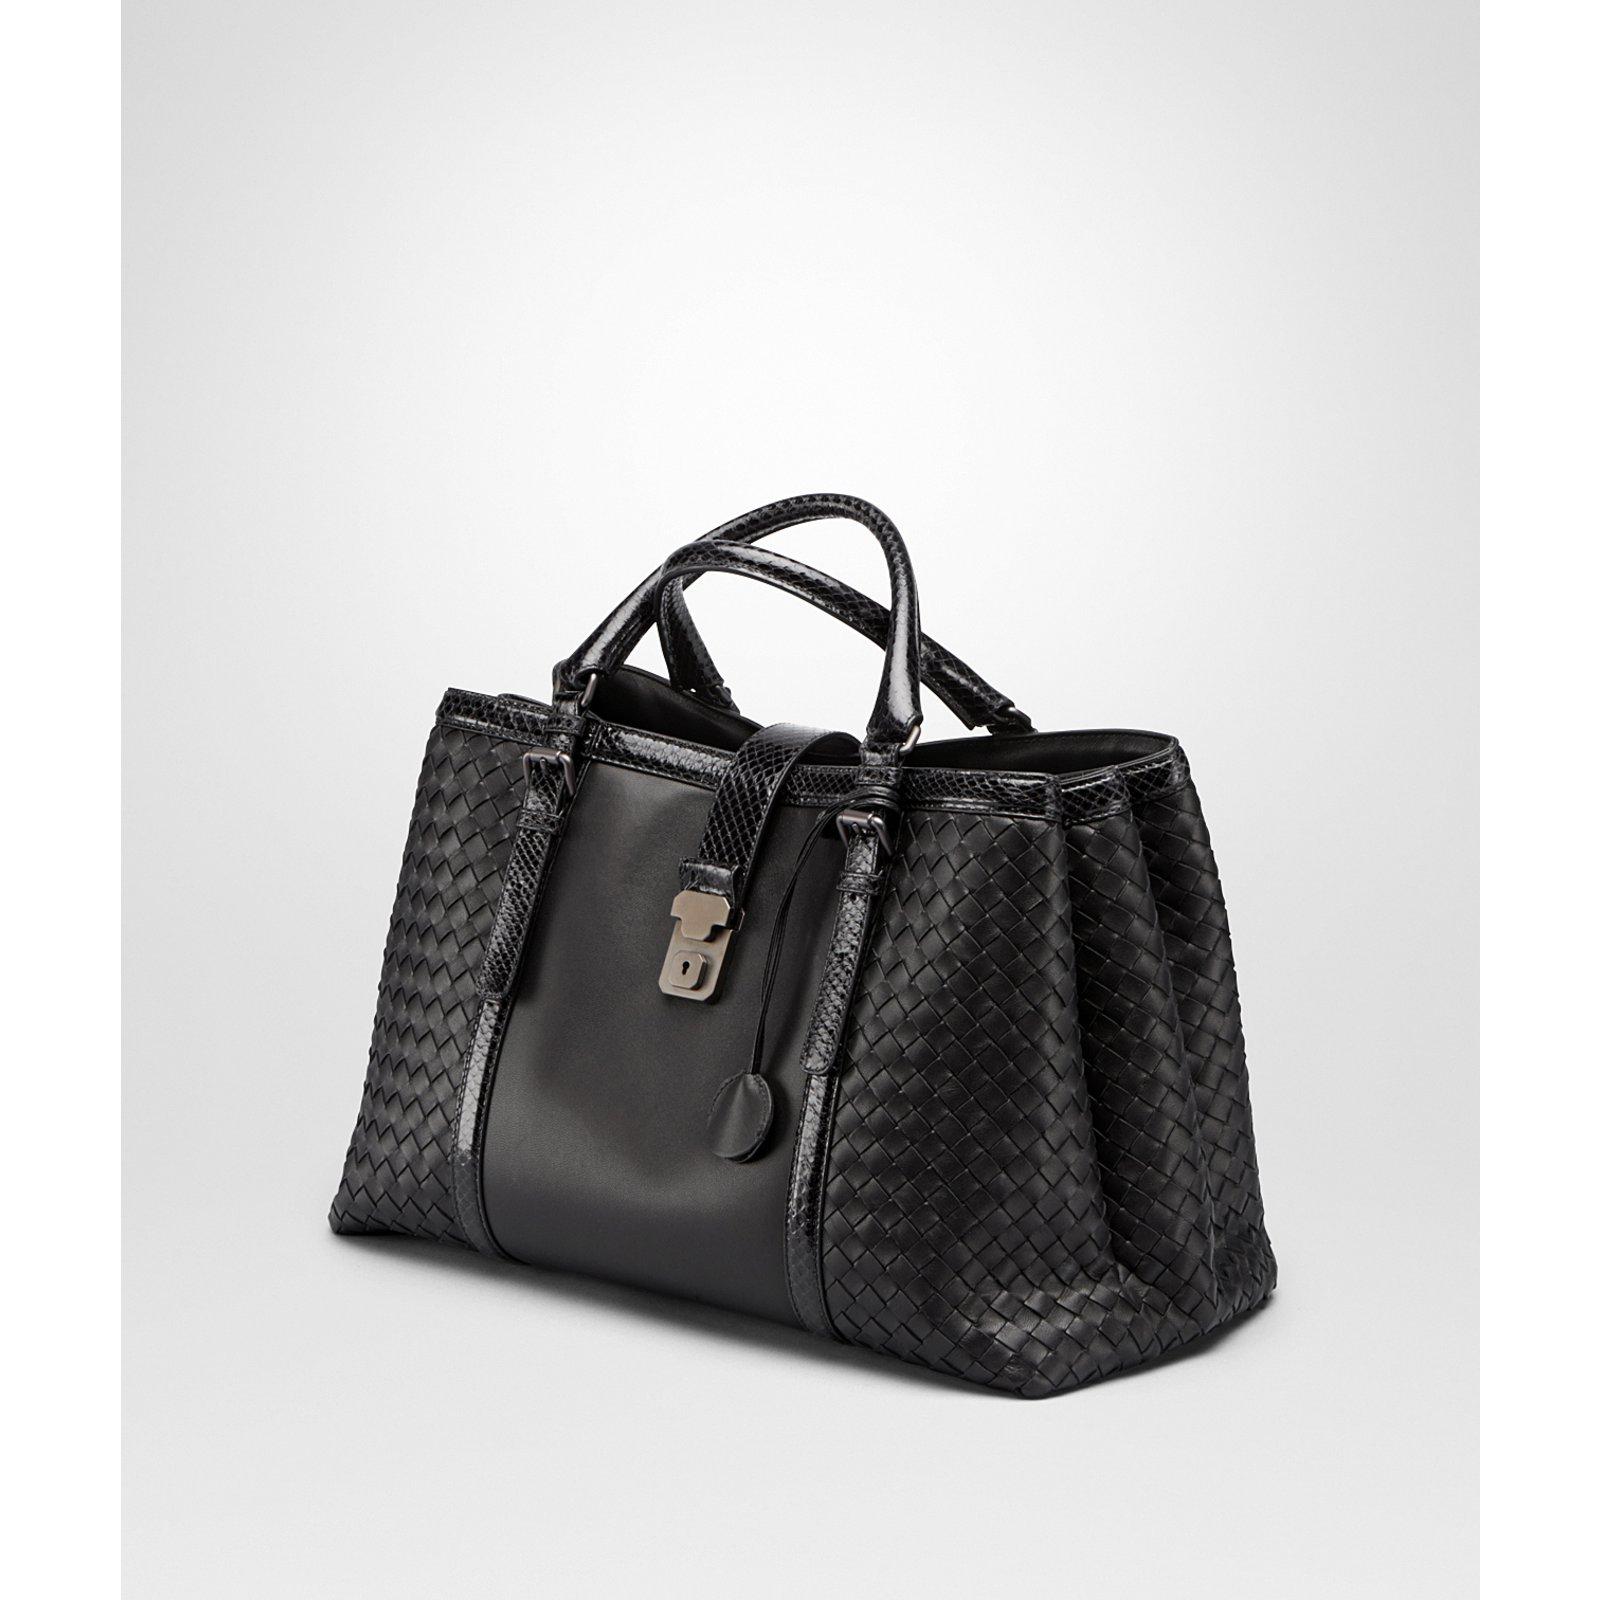 Facebook · Pin This. Bottega Veneta AYERS SNAKE AND NAPPA Handbags Leather  ... 25101b57f548e